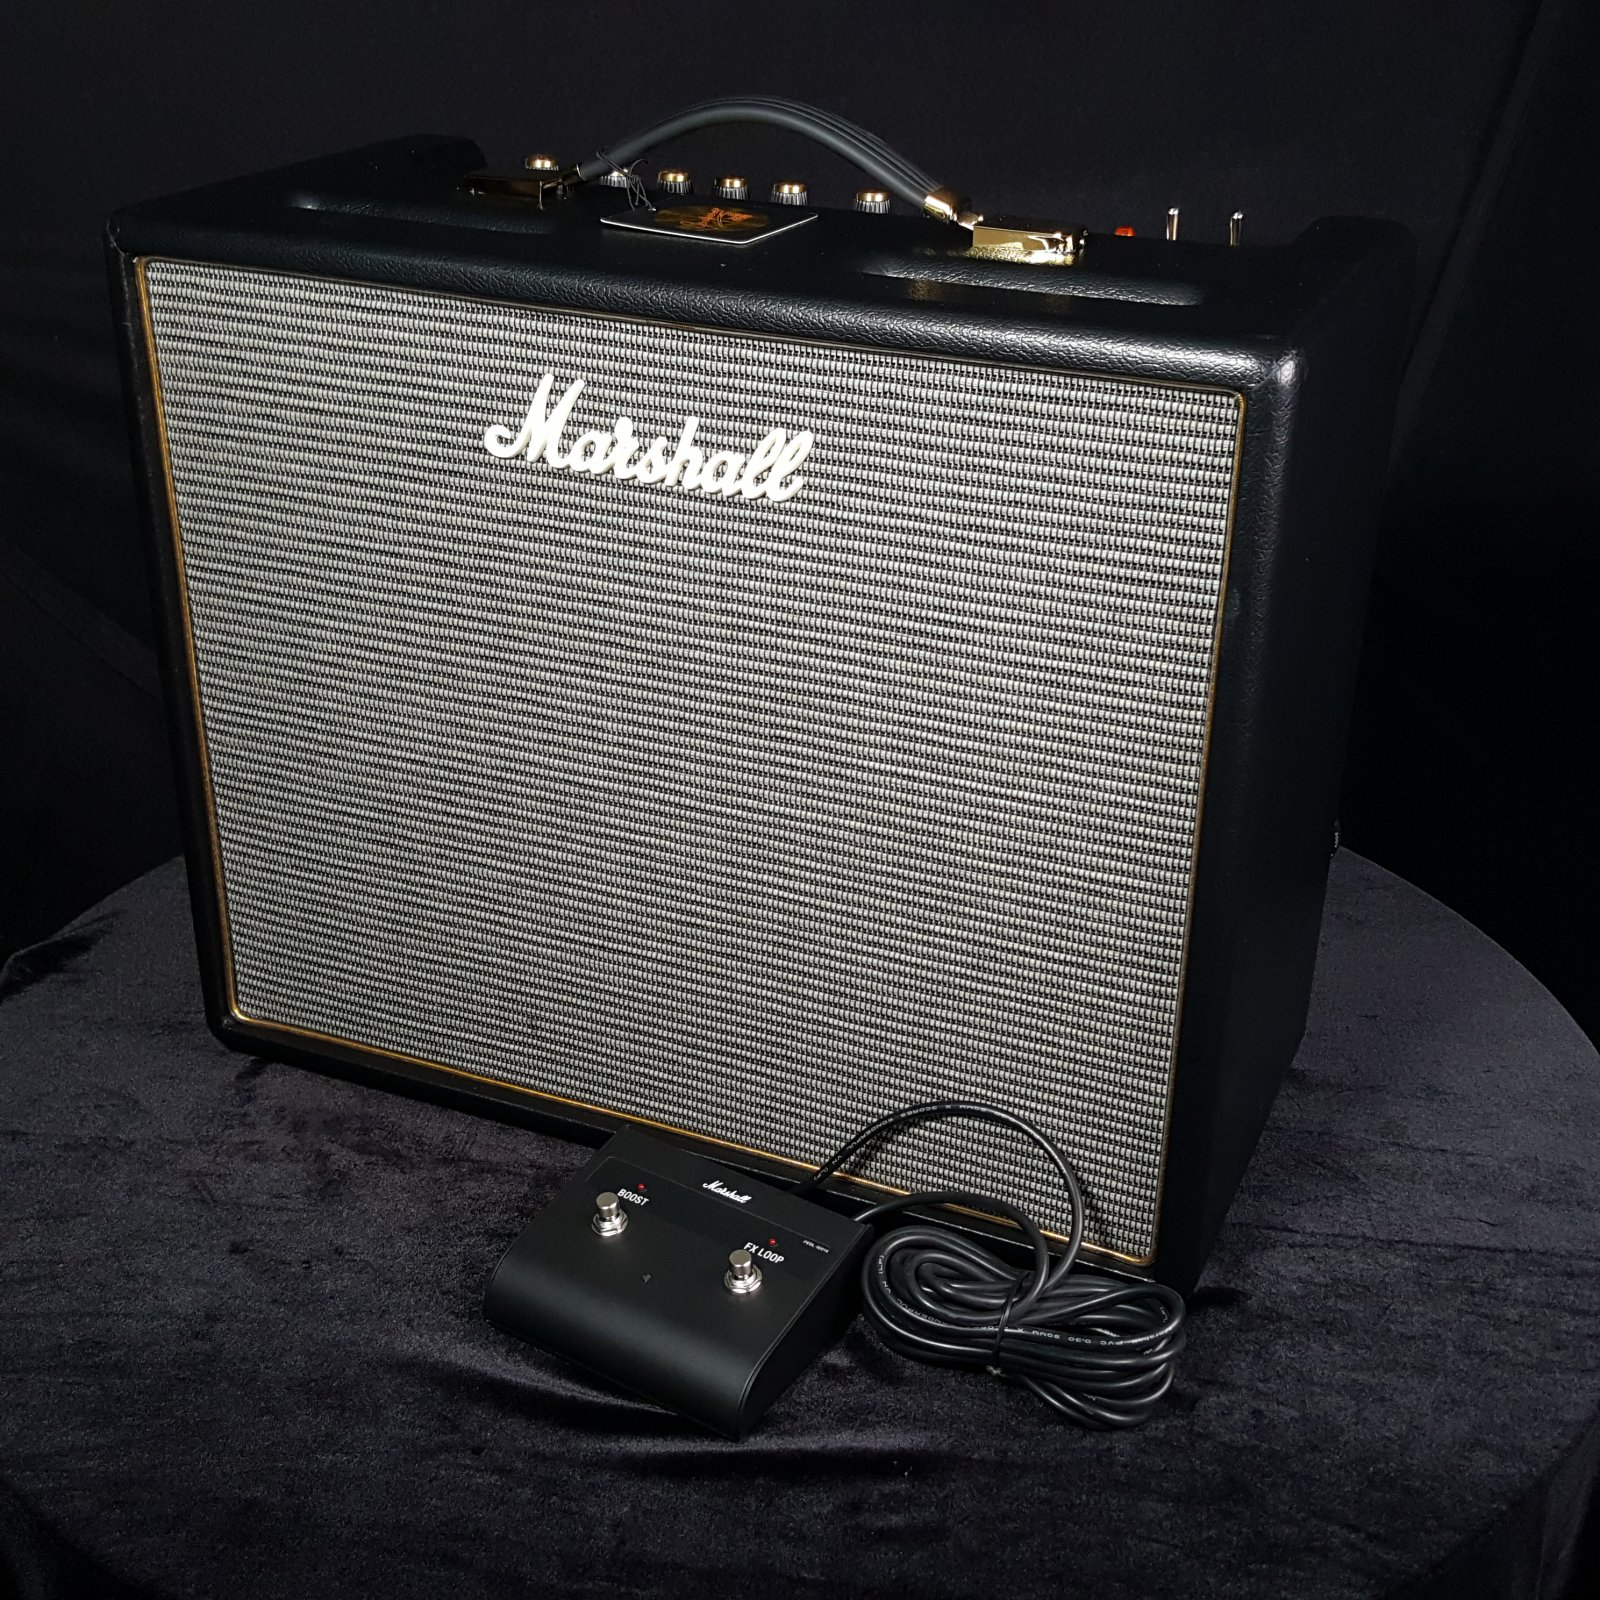 Marshall Origin 1 x 10 20C 20 Watt Tube Electric Guitar Combo Amplifier